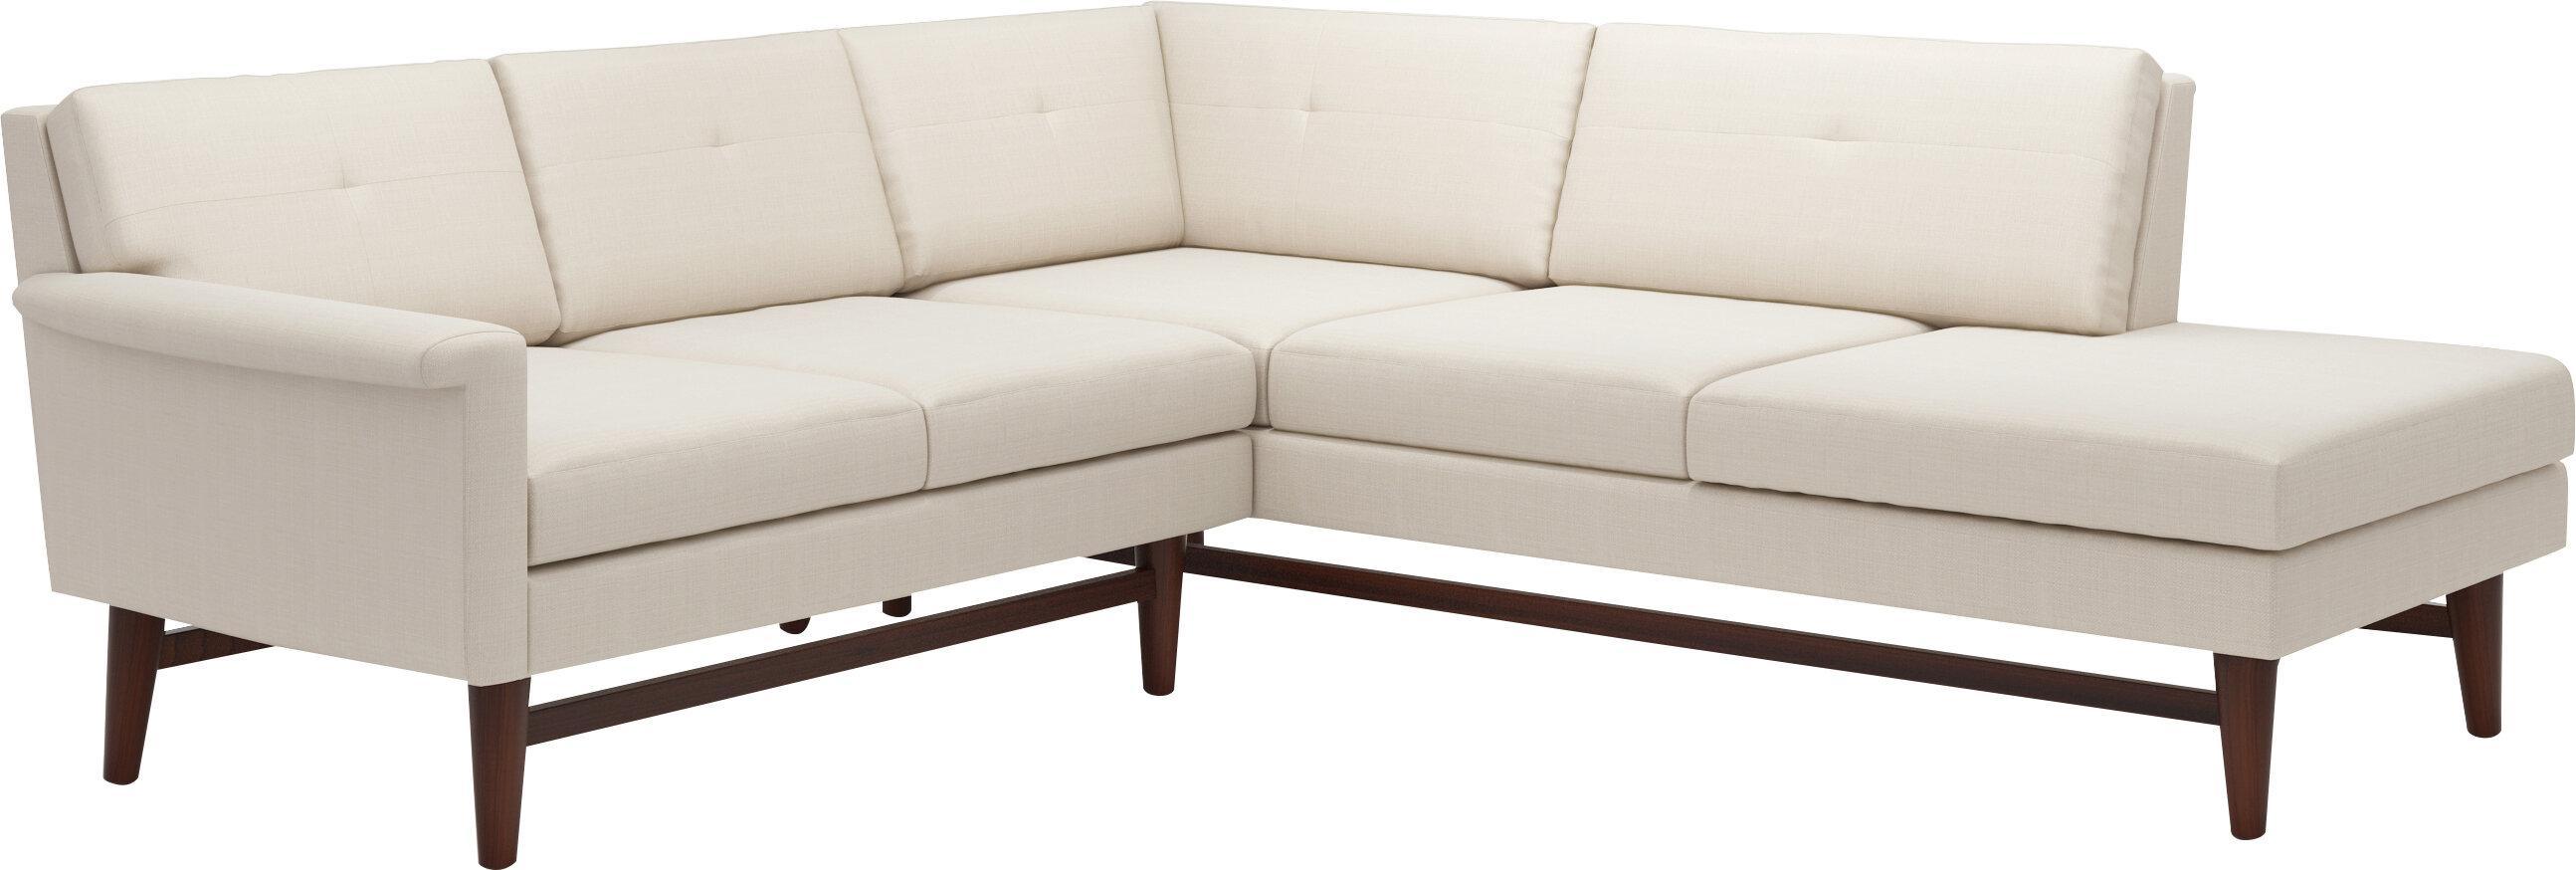 Superbe TrueModern Diggity Corner Sectional Sofa With Bumper | Wayfair